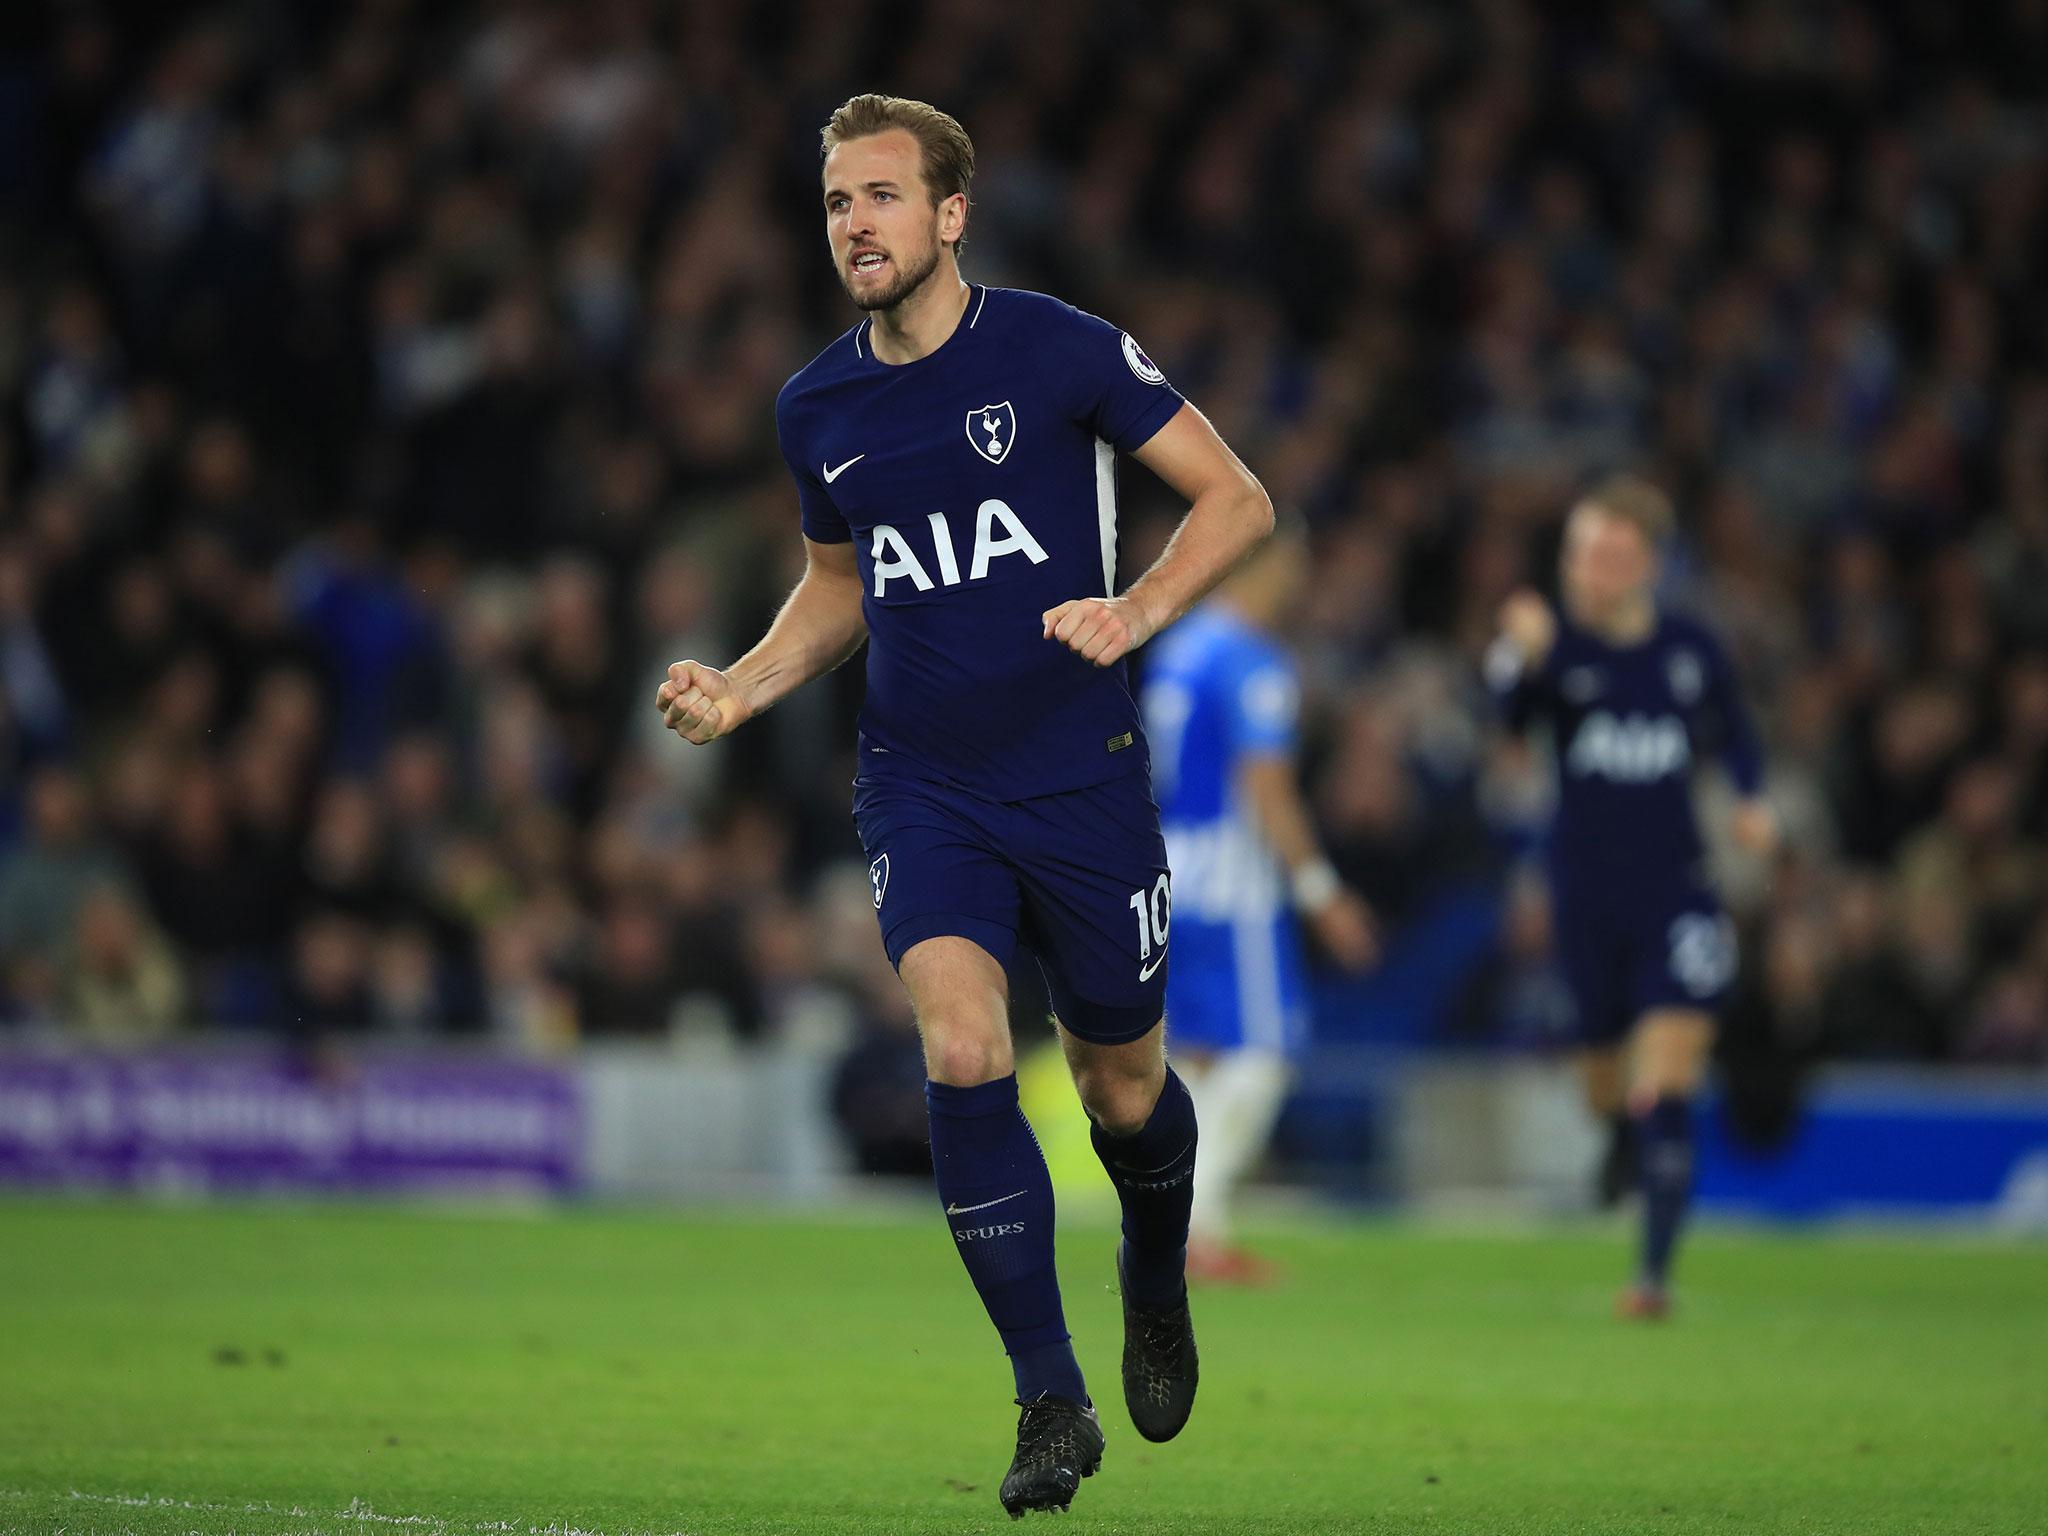 Tottenham's Harry Kane 'not bothered in the slightest' by goal appeal backlash